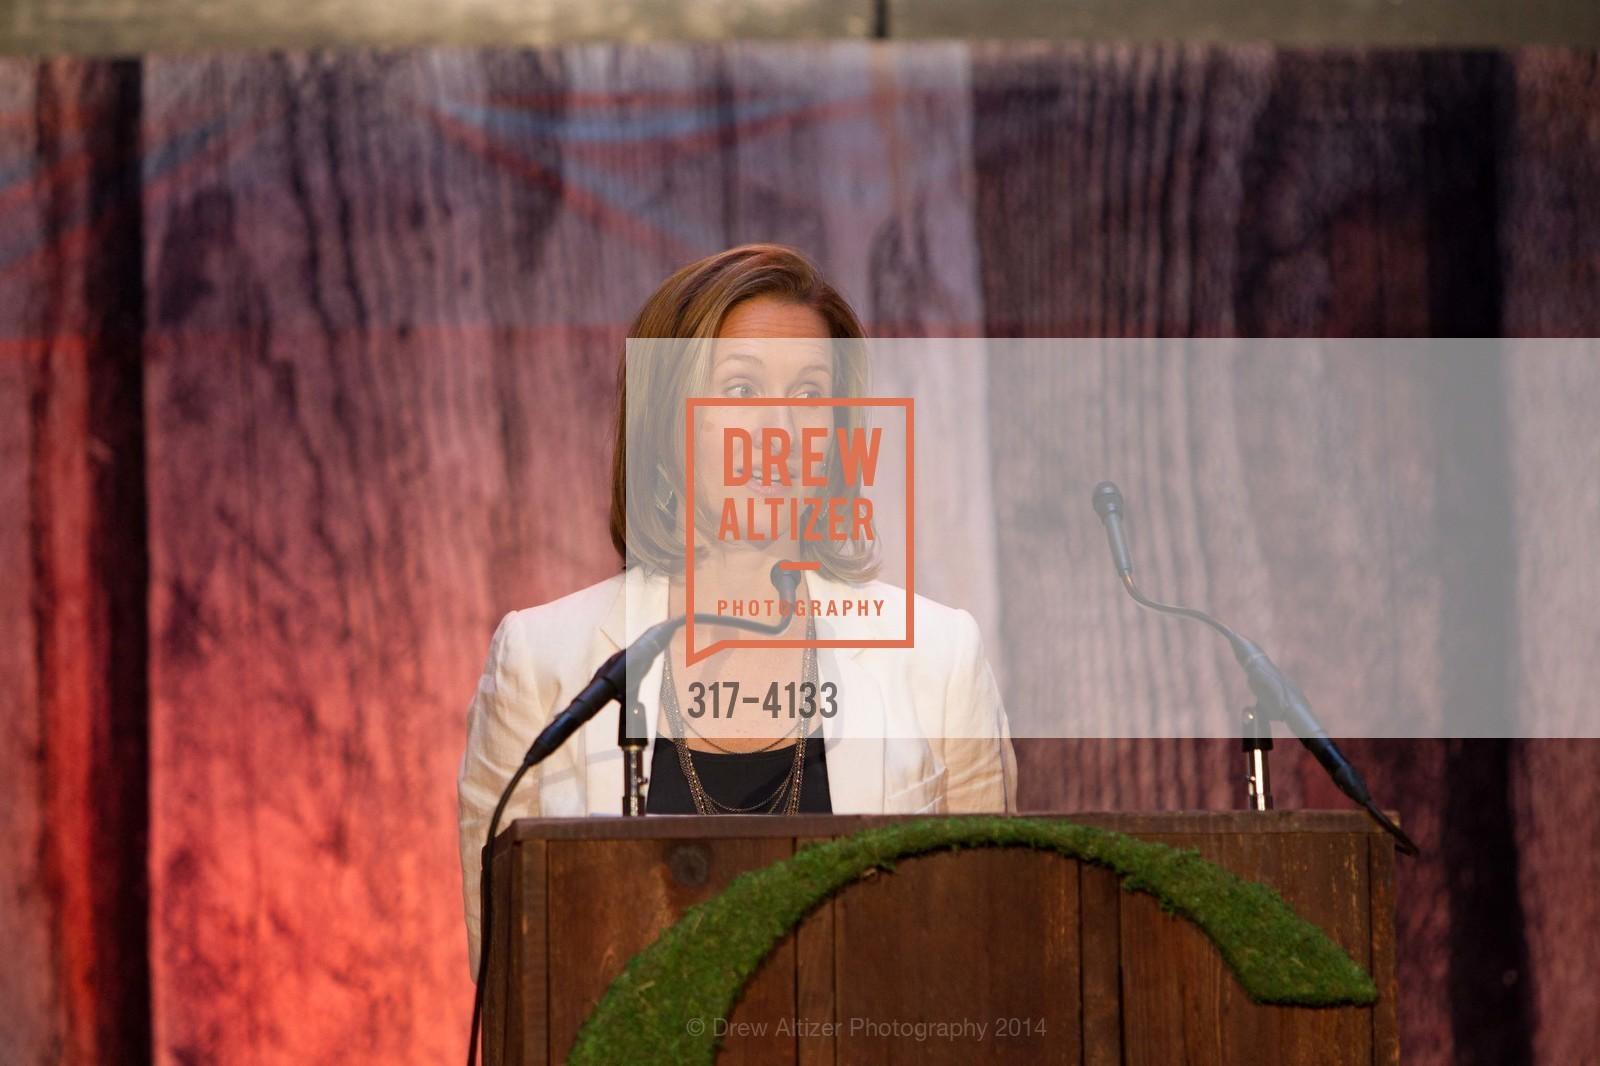 Carol McDonnell, Photo #317-4133